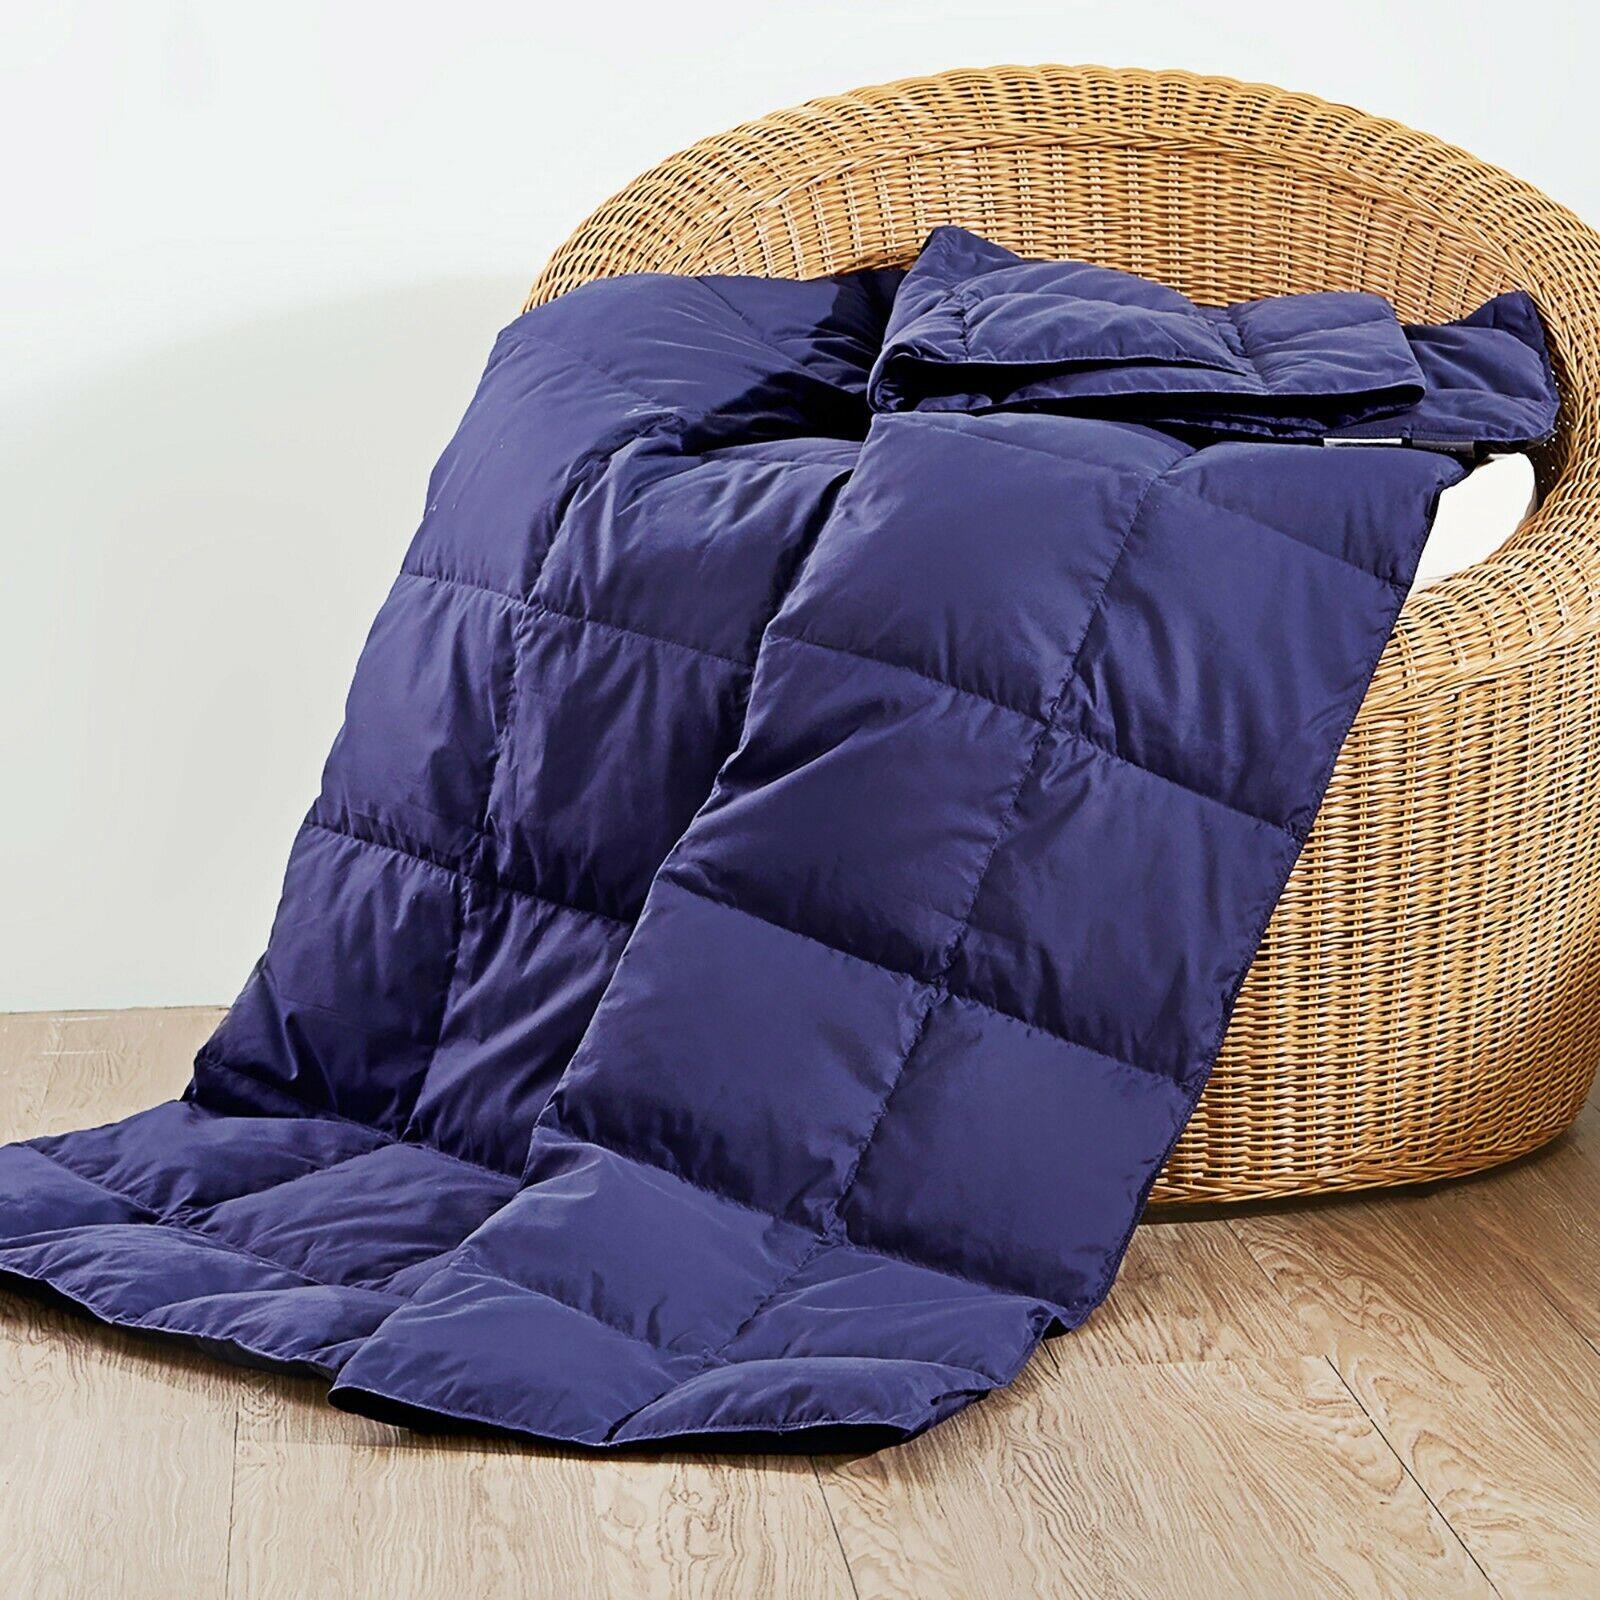 down throw blanket portable smart travel blanket